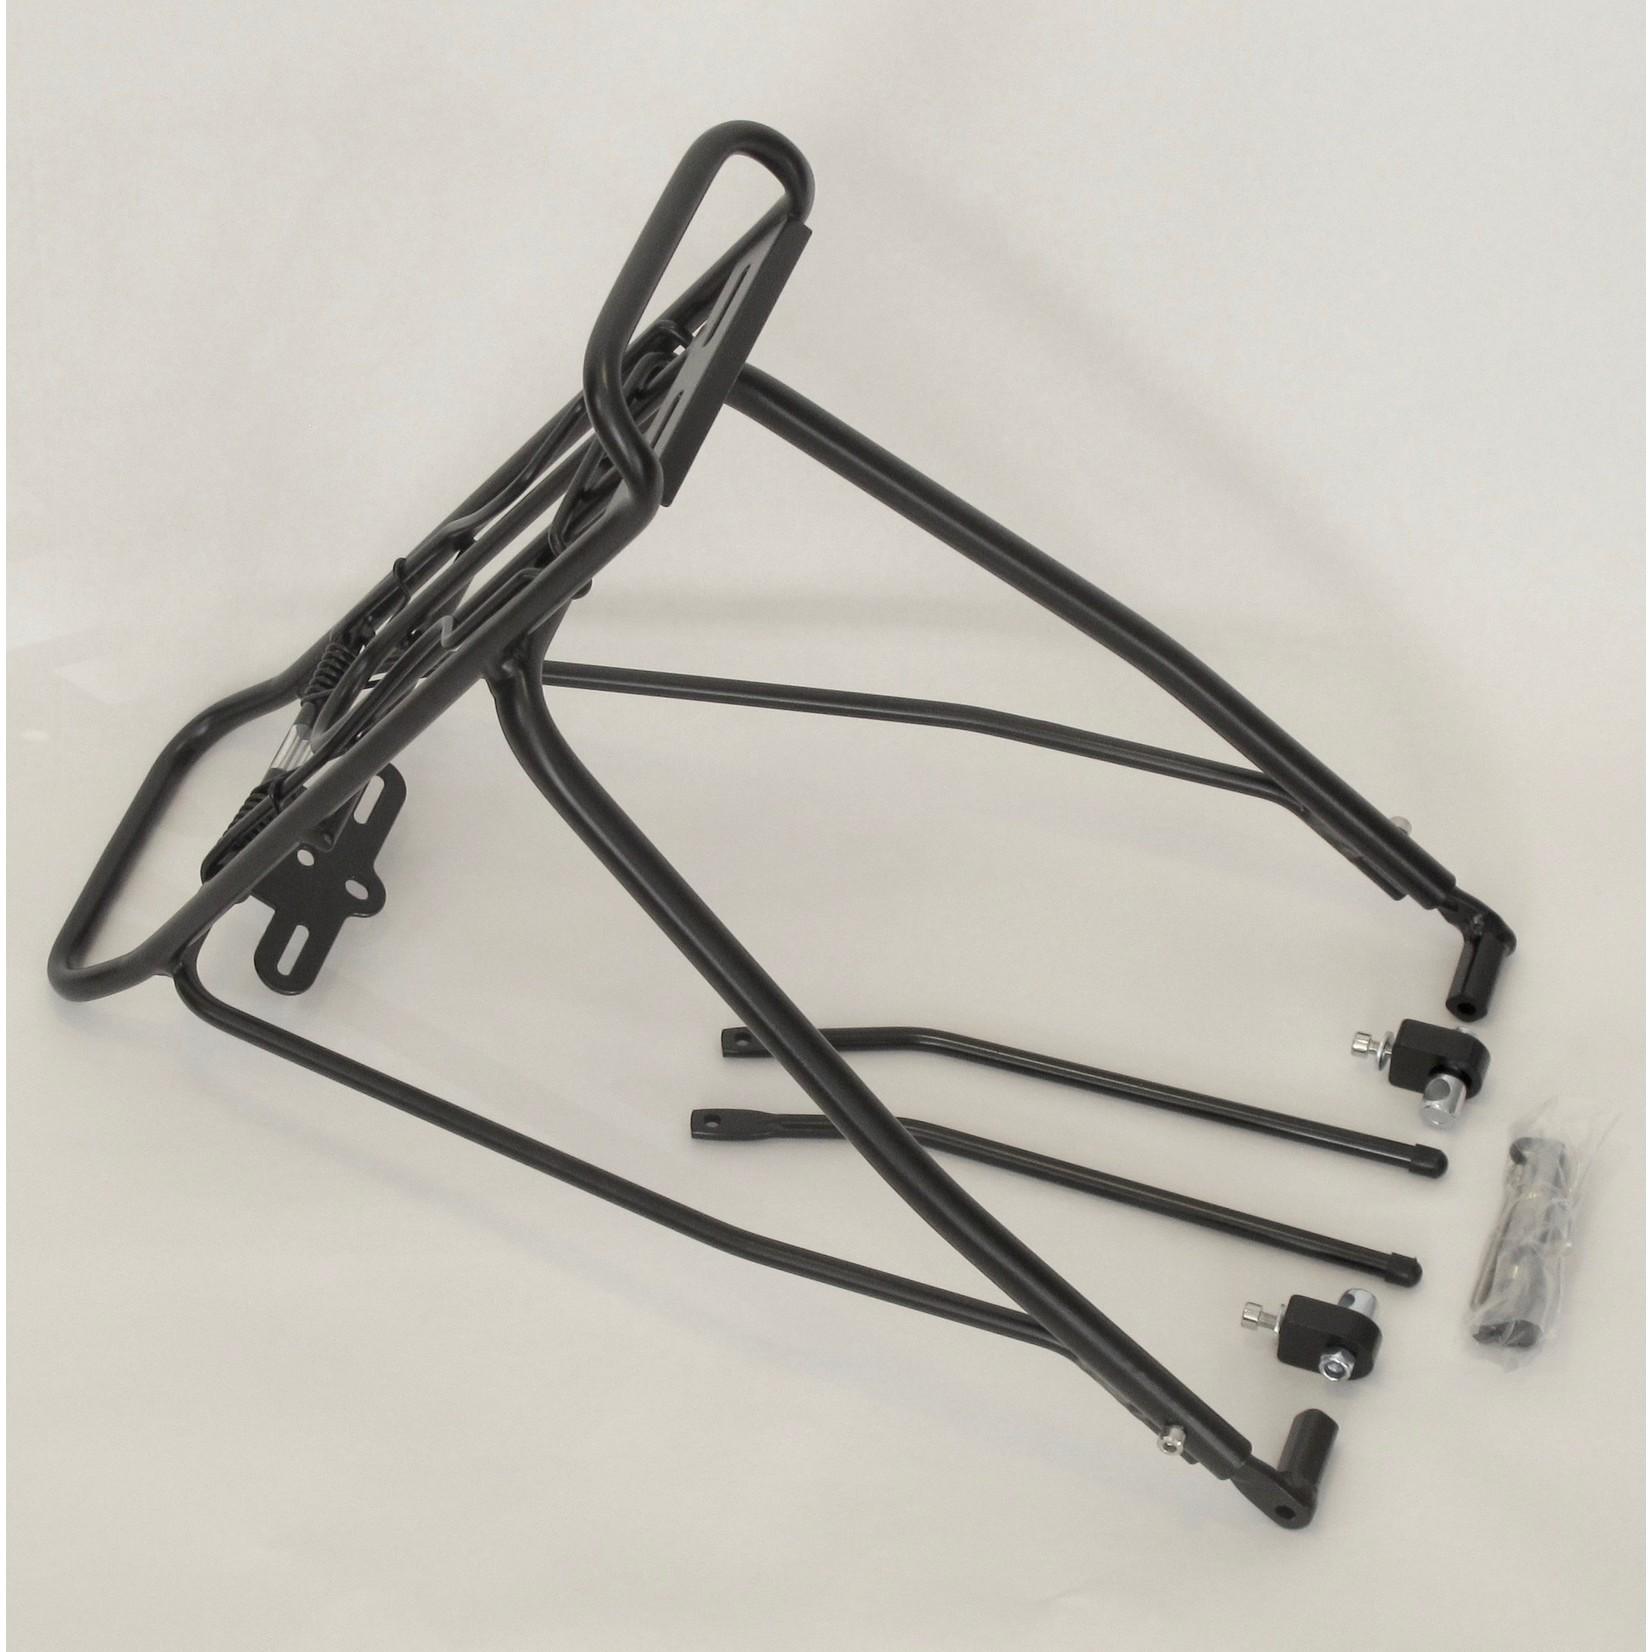 LarryvsHarry LarryvsHarry Rear rack + attachment